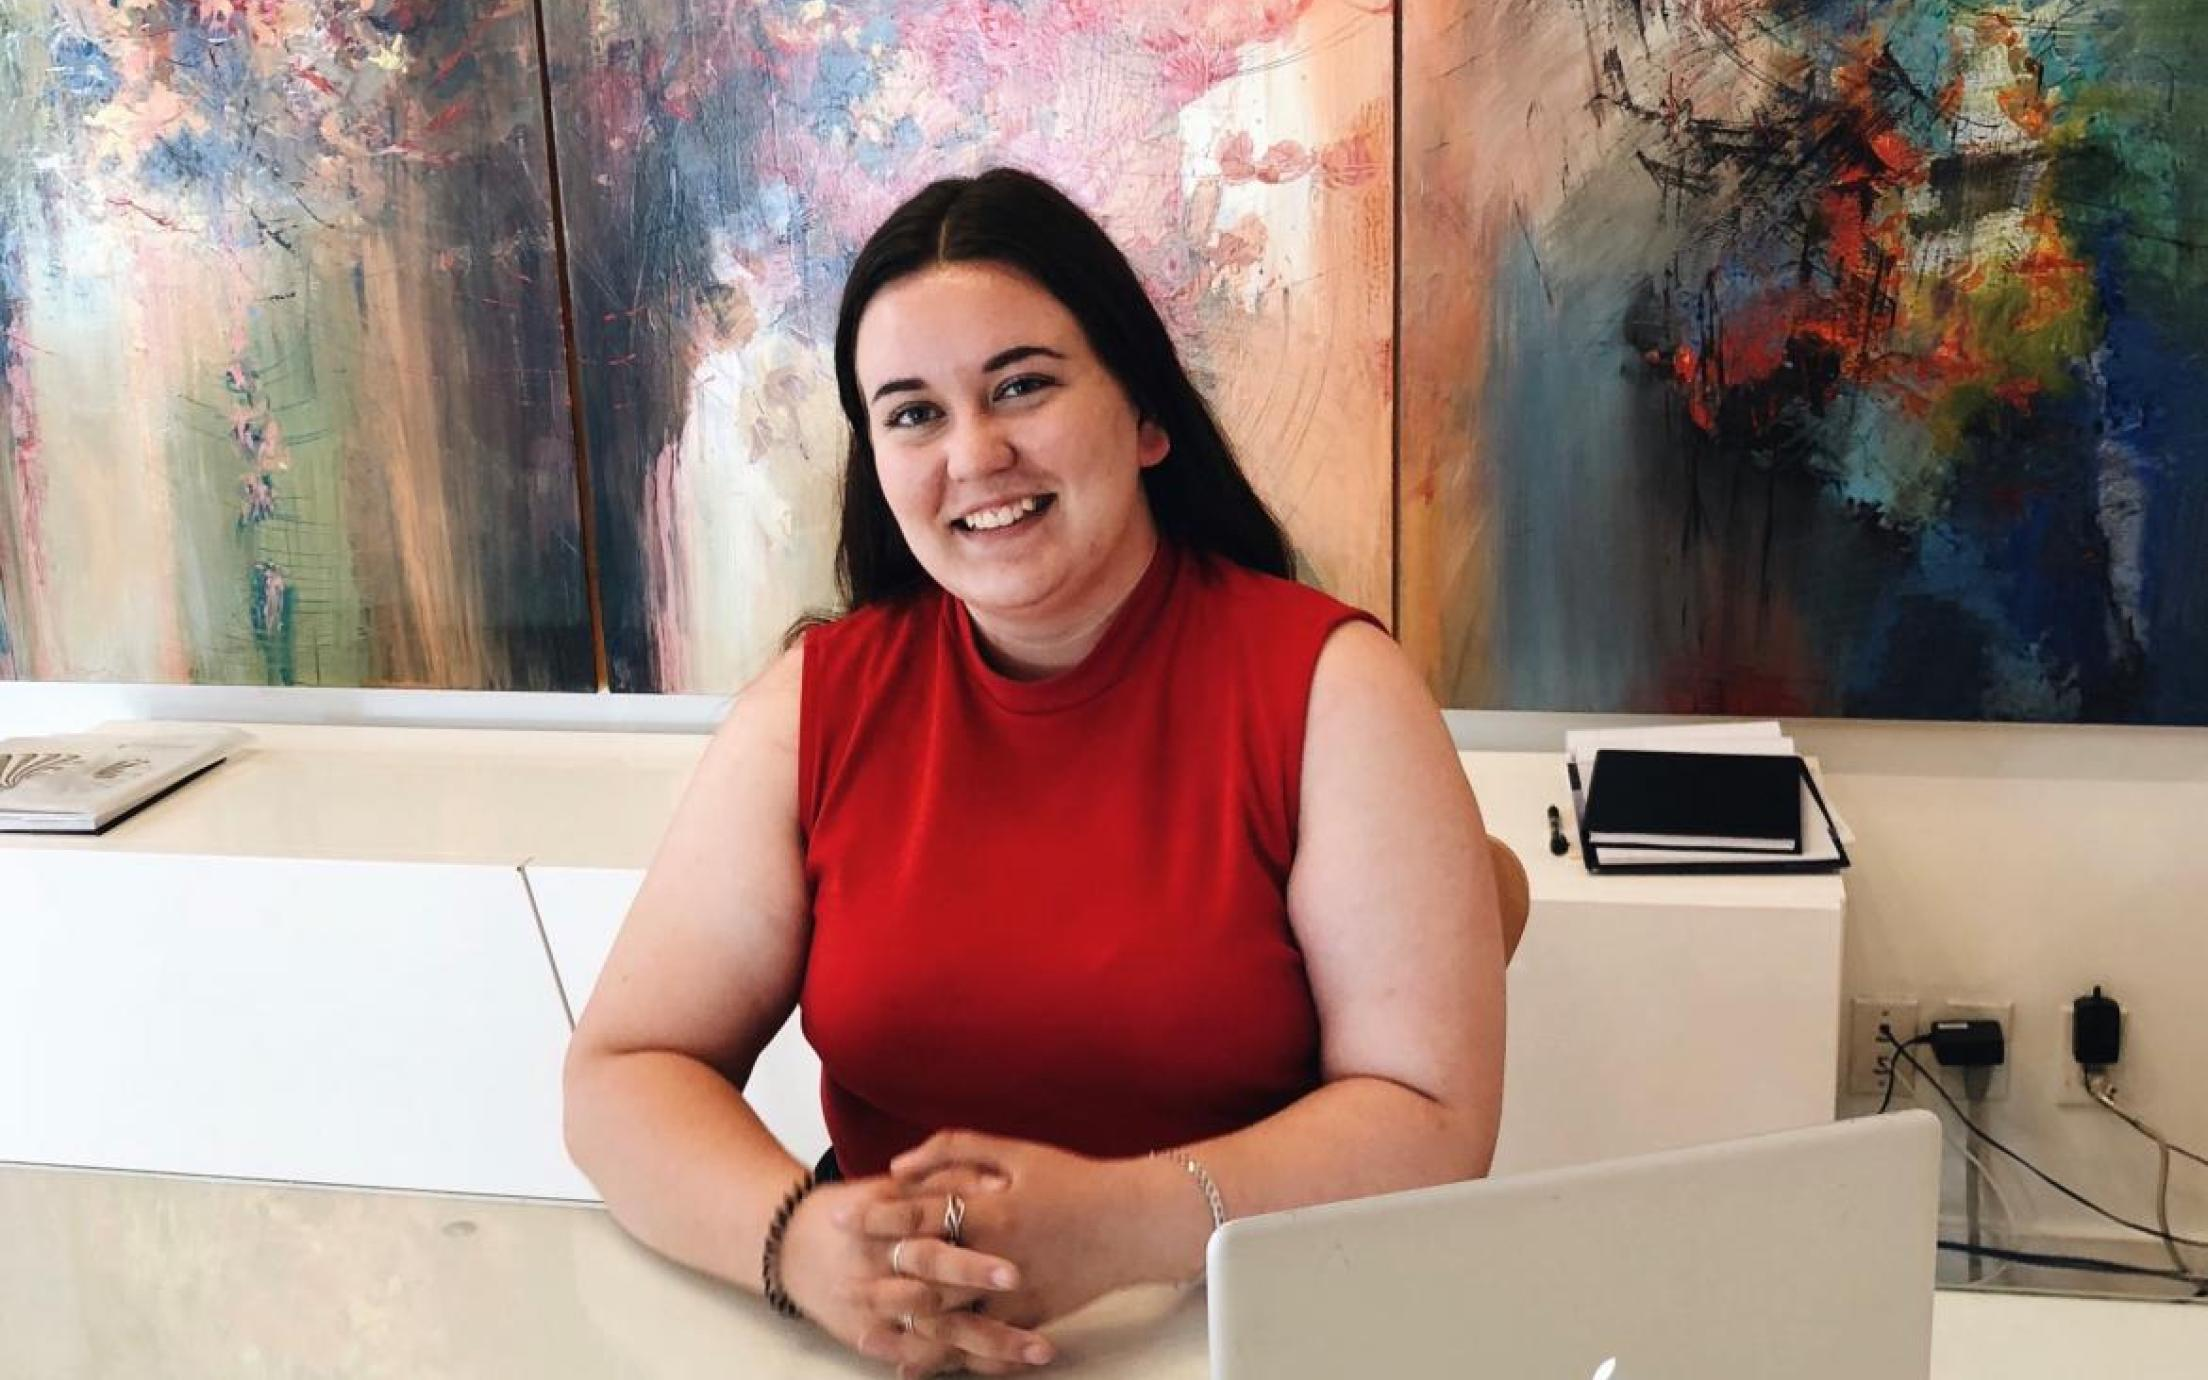 Bachelor of Arts, Visual Art major student Maggie Hinbest